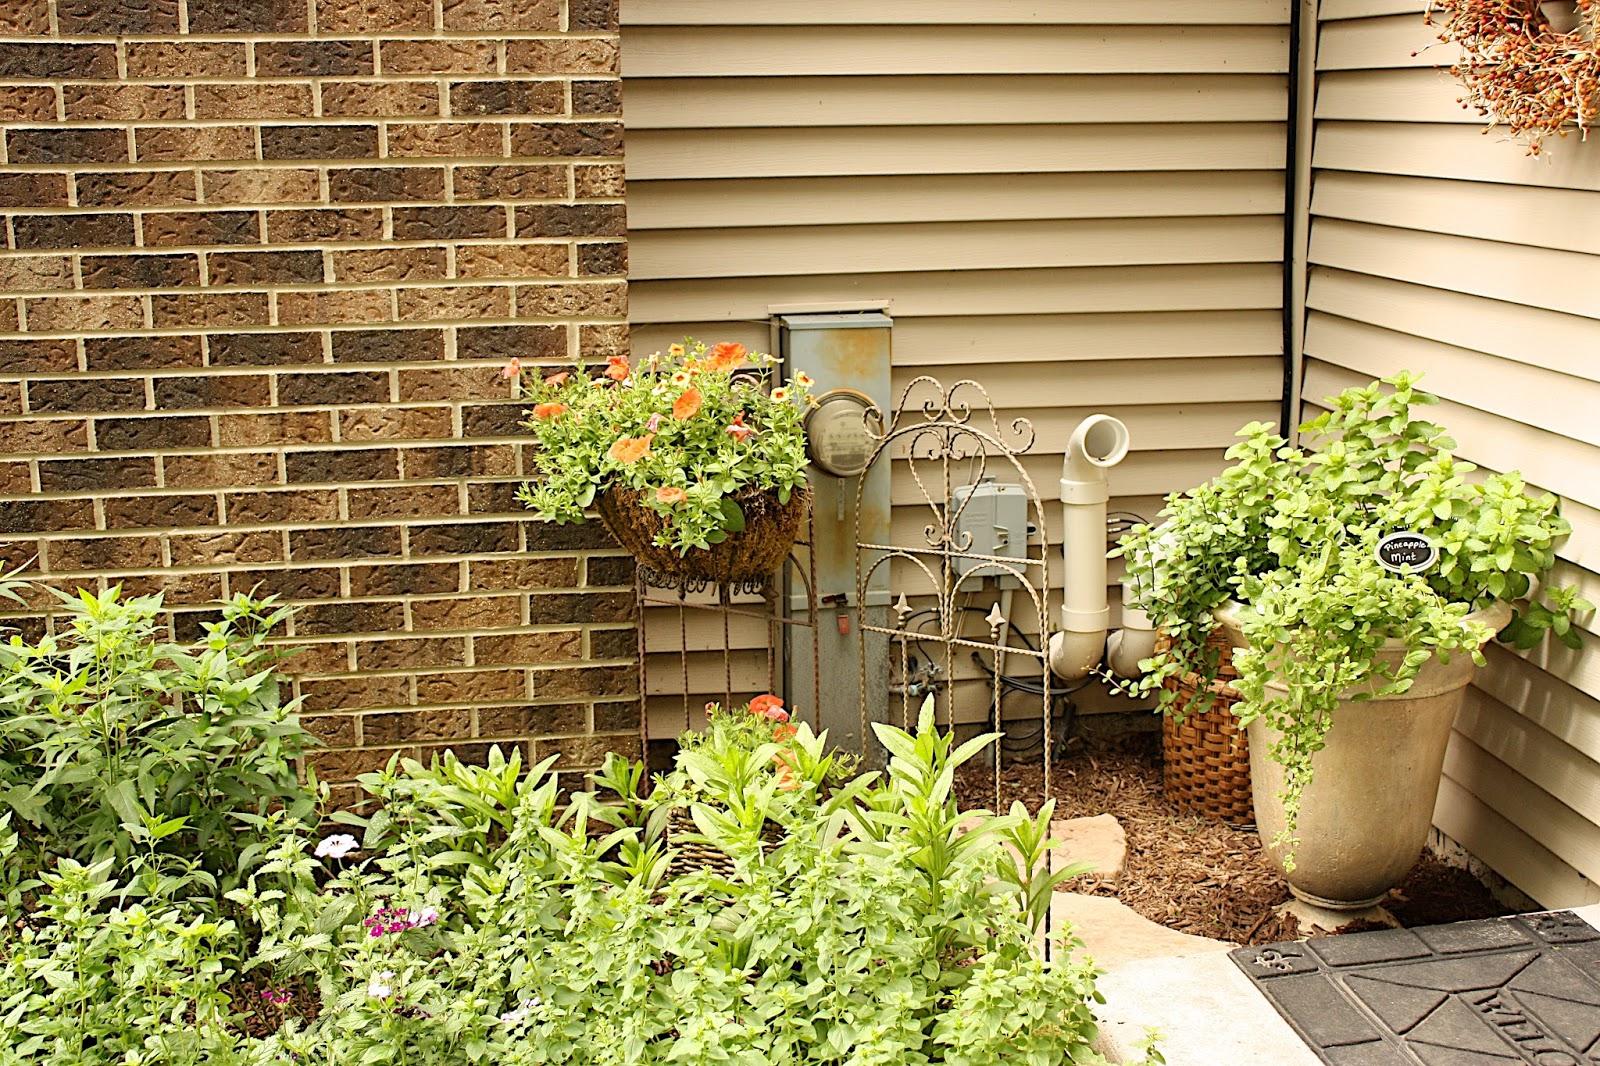 The Edgy Gardener Blog: Garden Walk: Rockford, IL (Post 2)